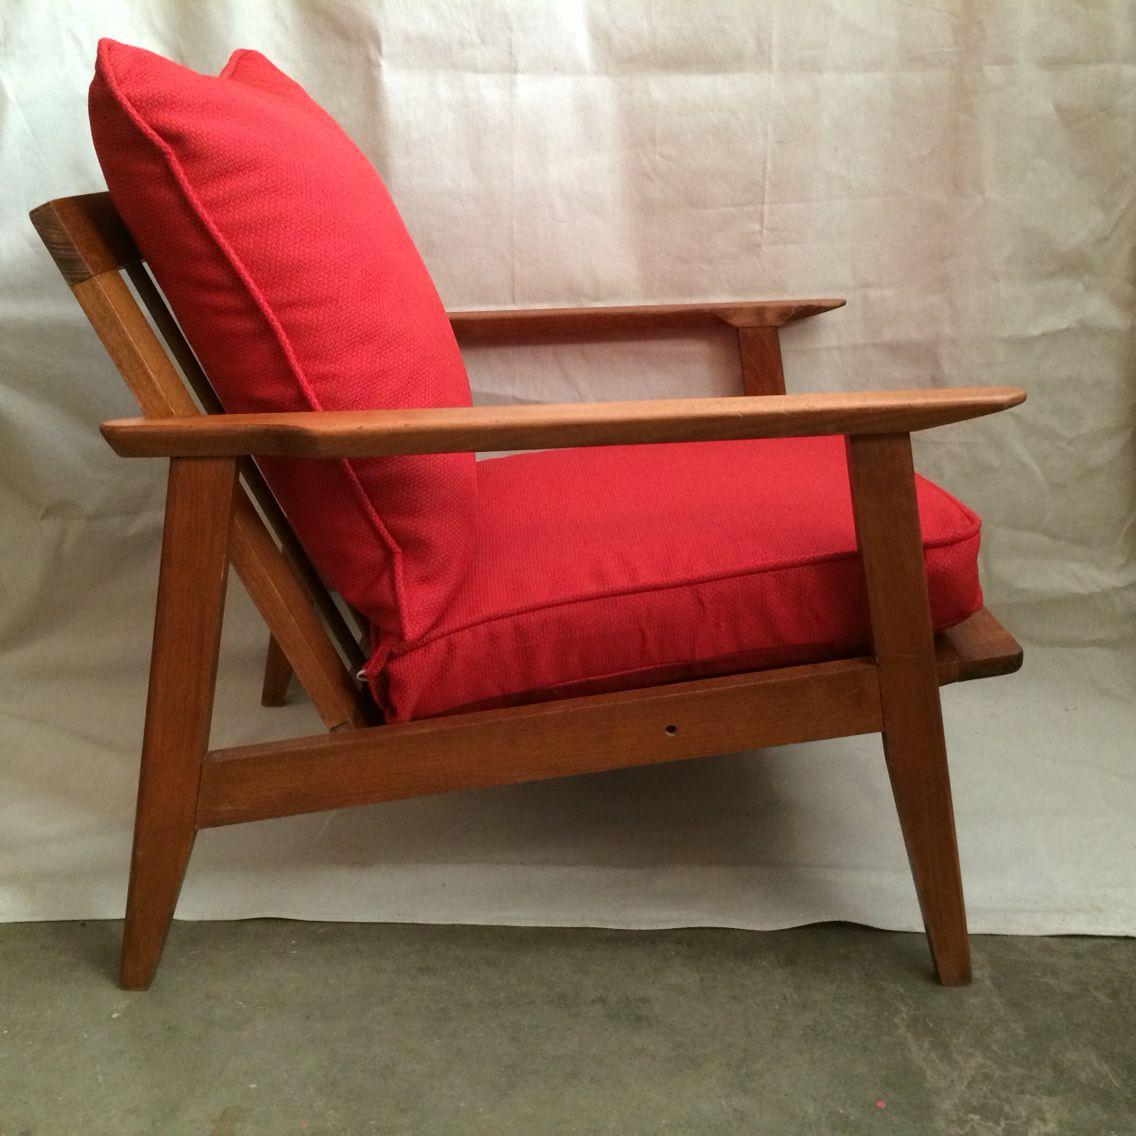 Vintage mid century modern Danish style slant back sitting chair